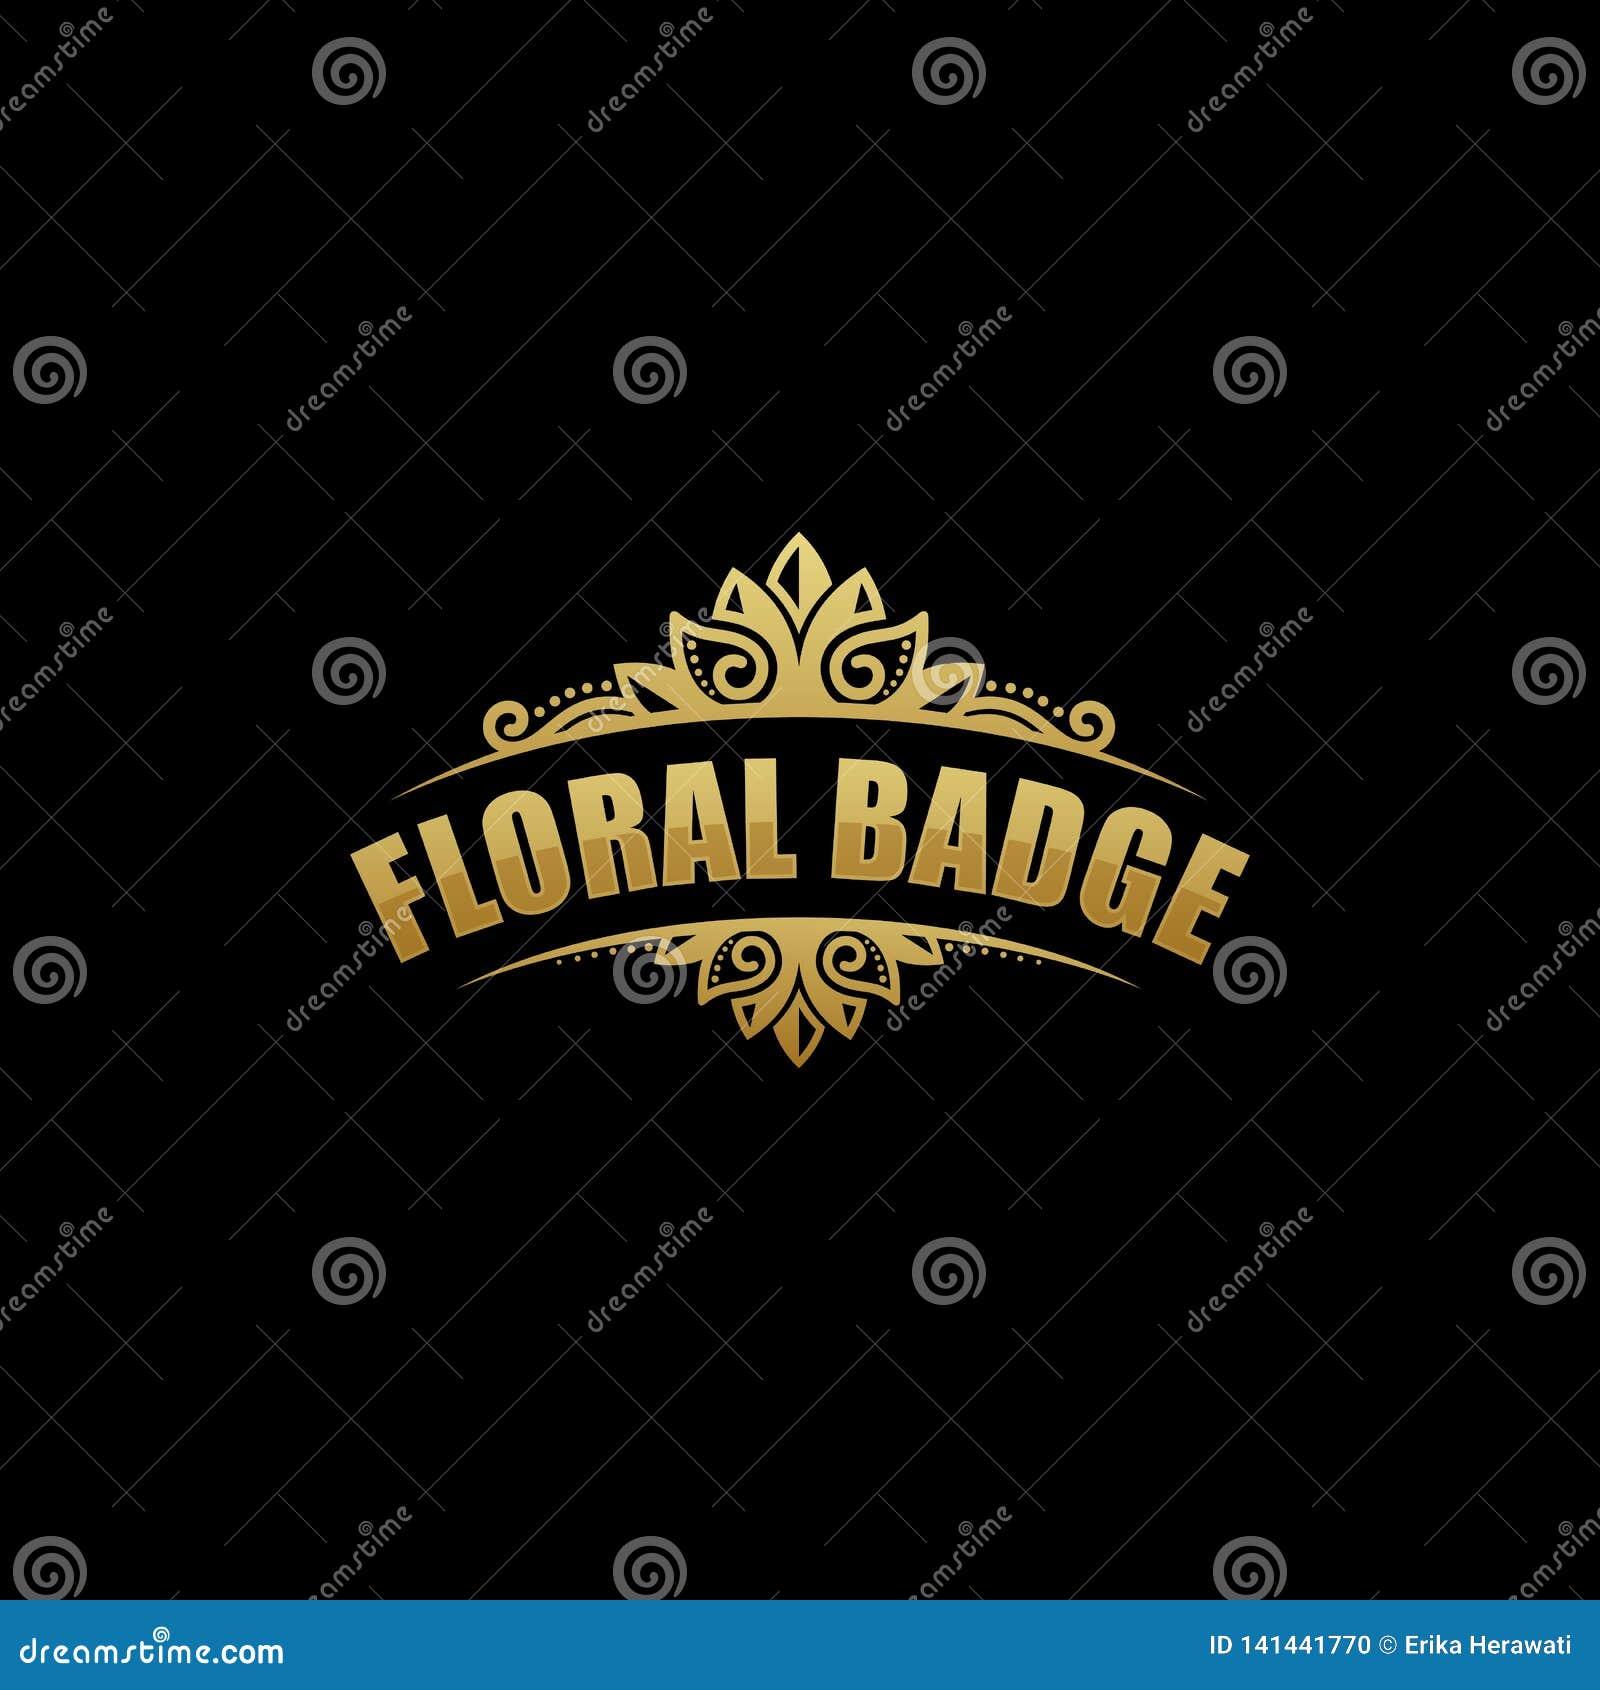 Floral Badge illustration vector template